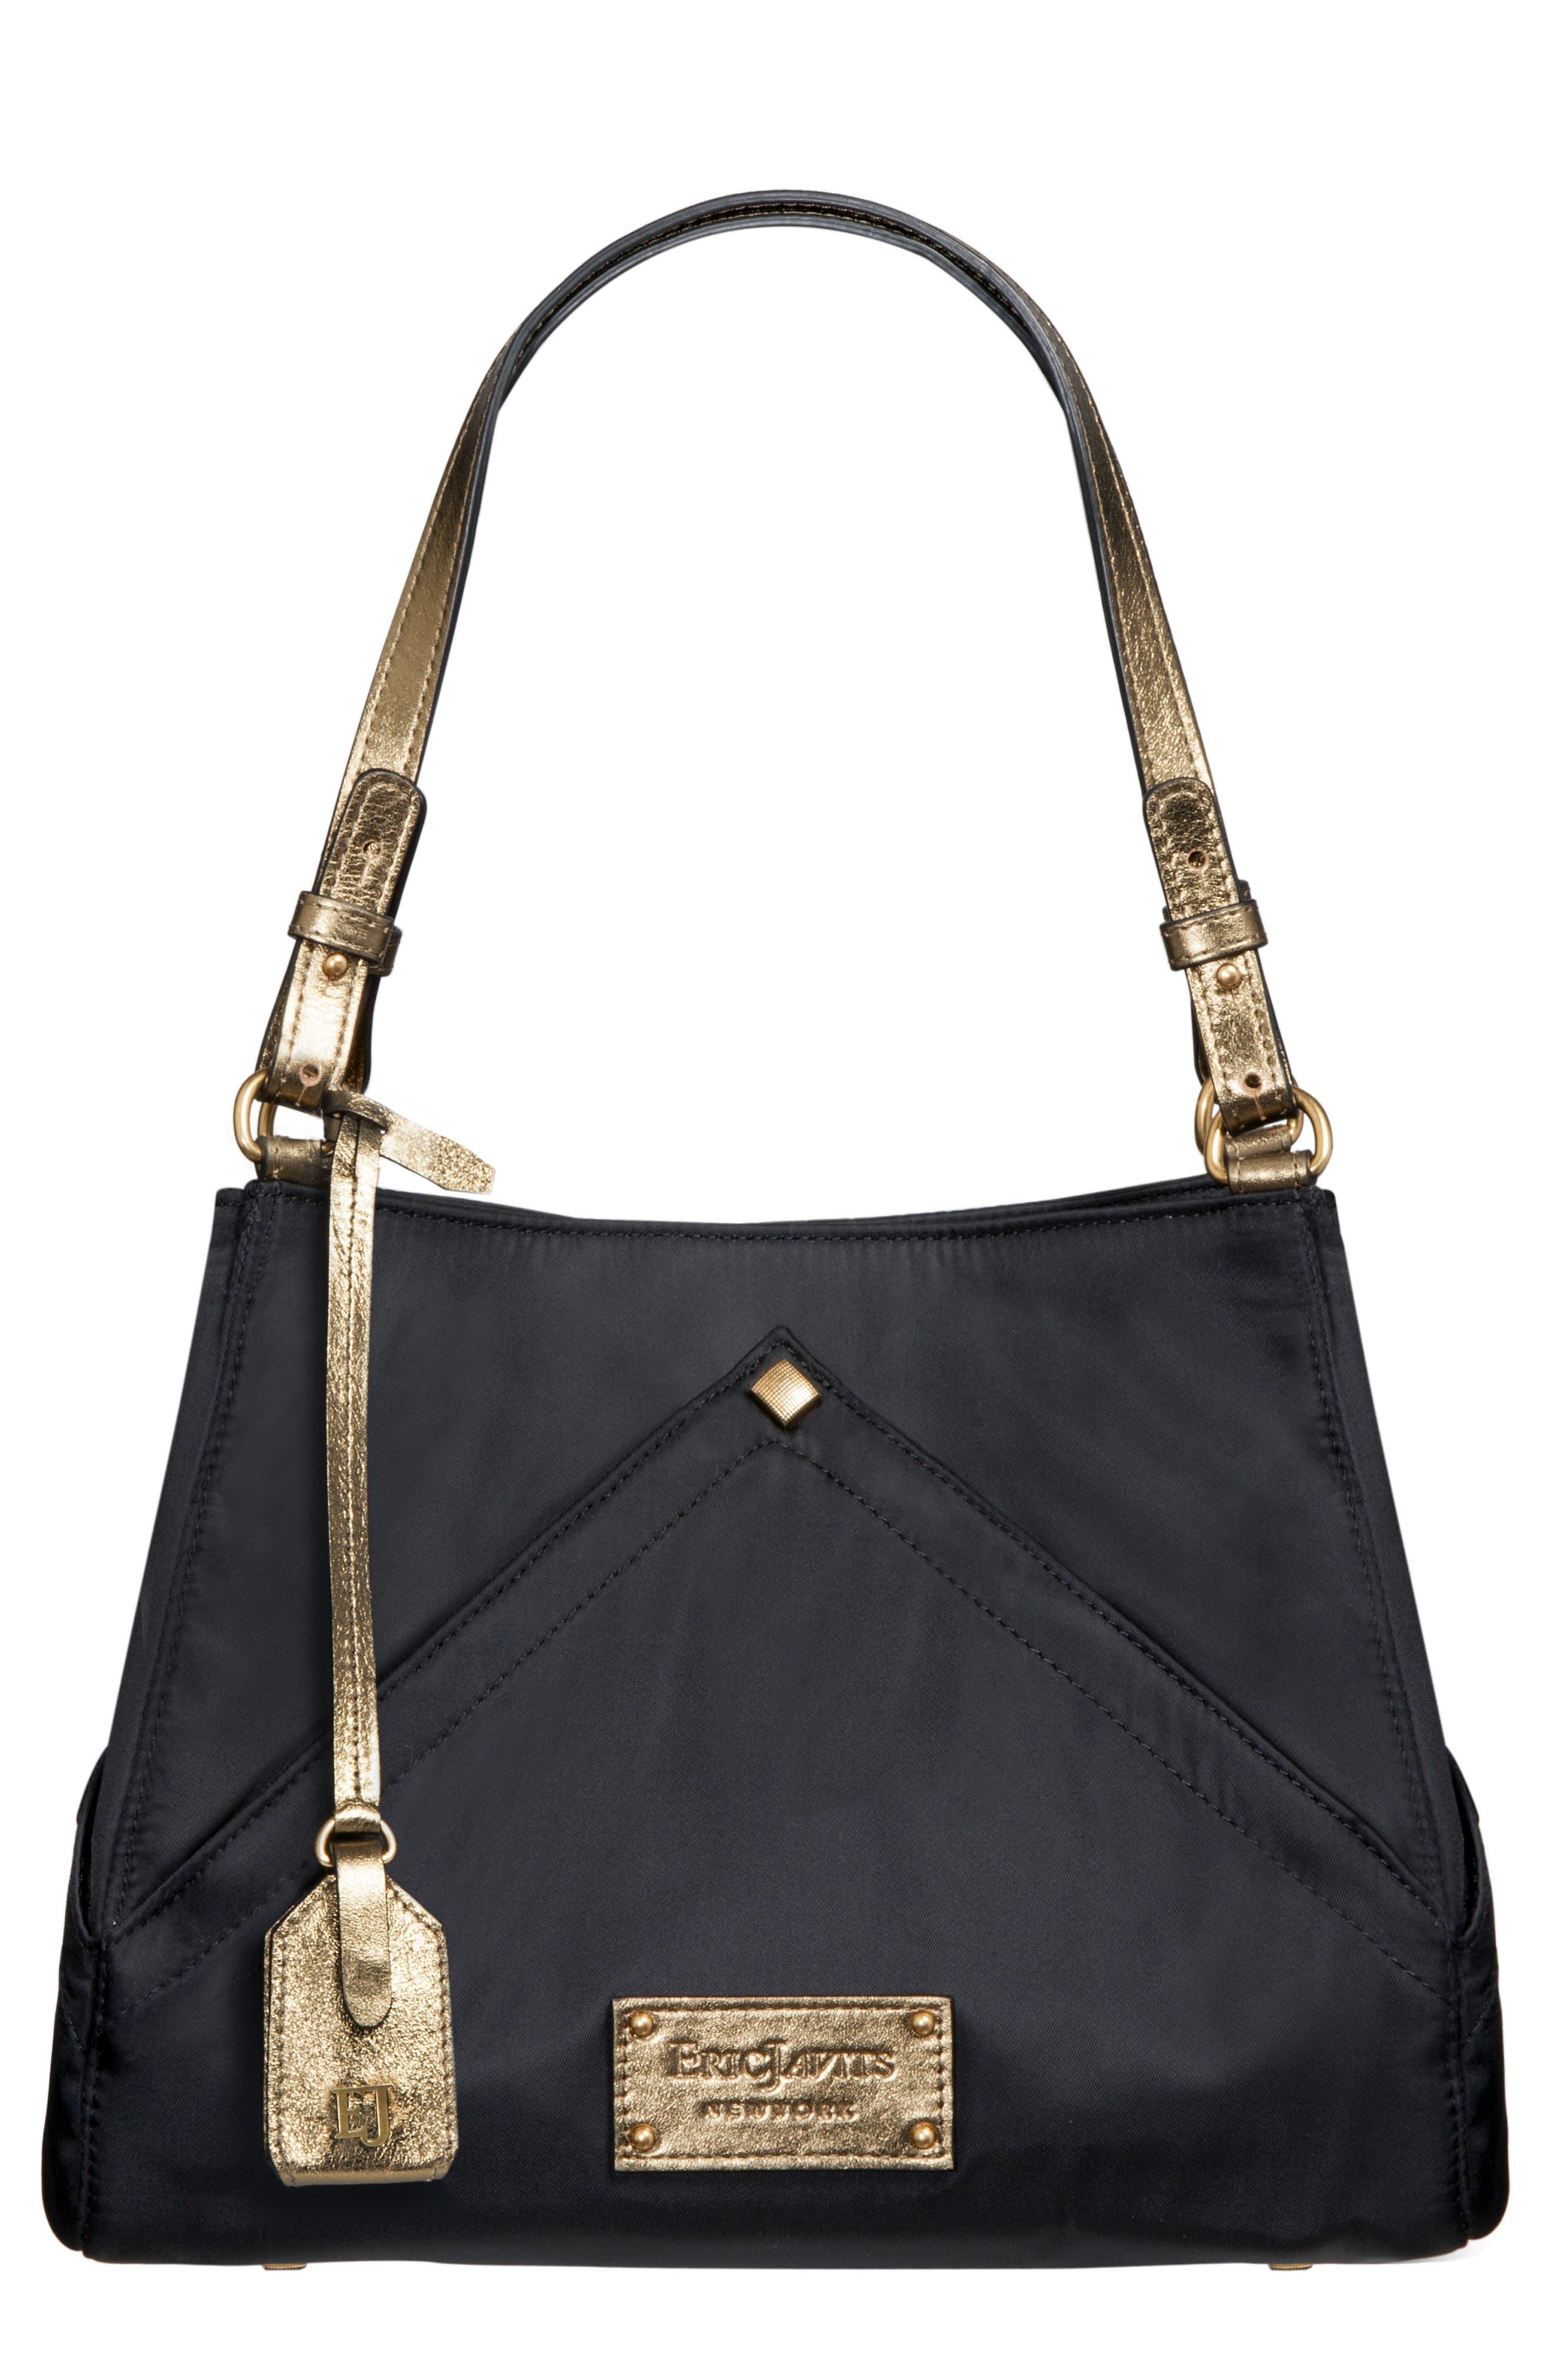 ERIC JAVITS Peyton Microfiber & Leather Shoulder Bag in Black/ Bronze